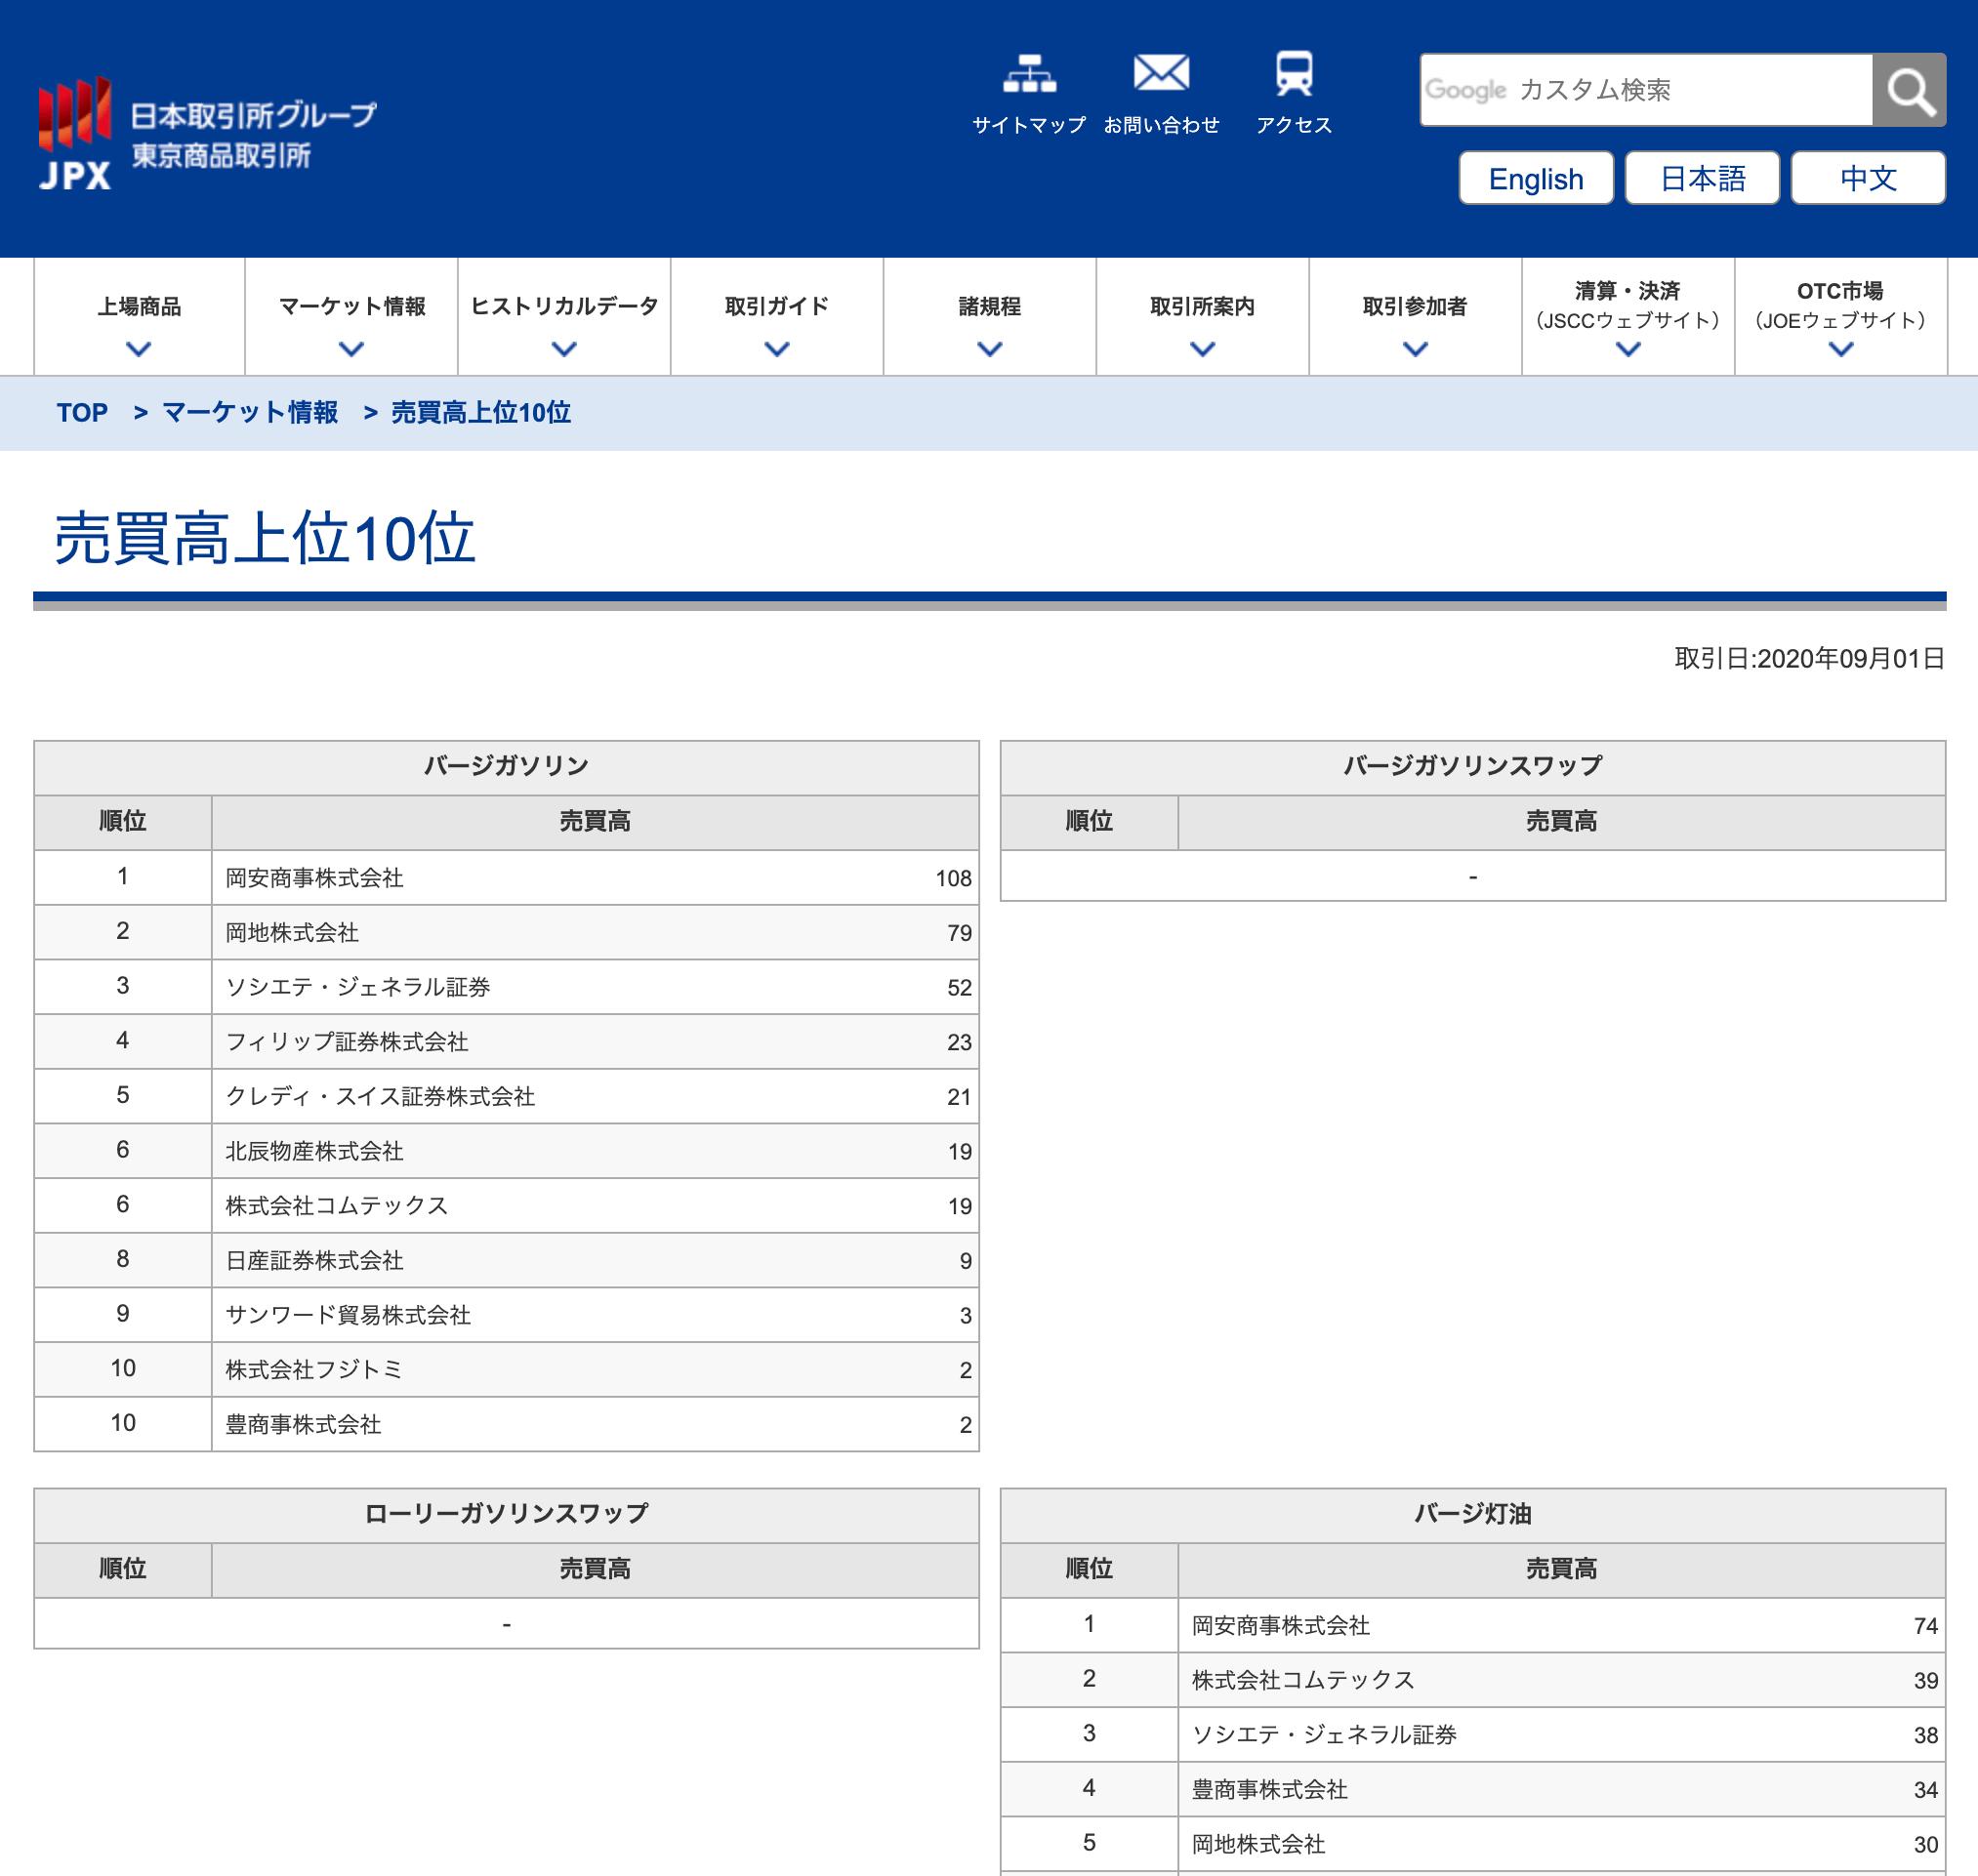 JPXグループTOCOM売買高上位10位